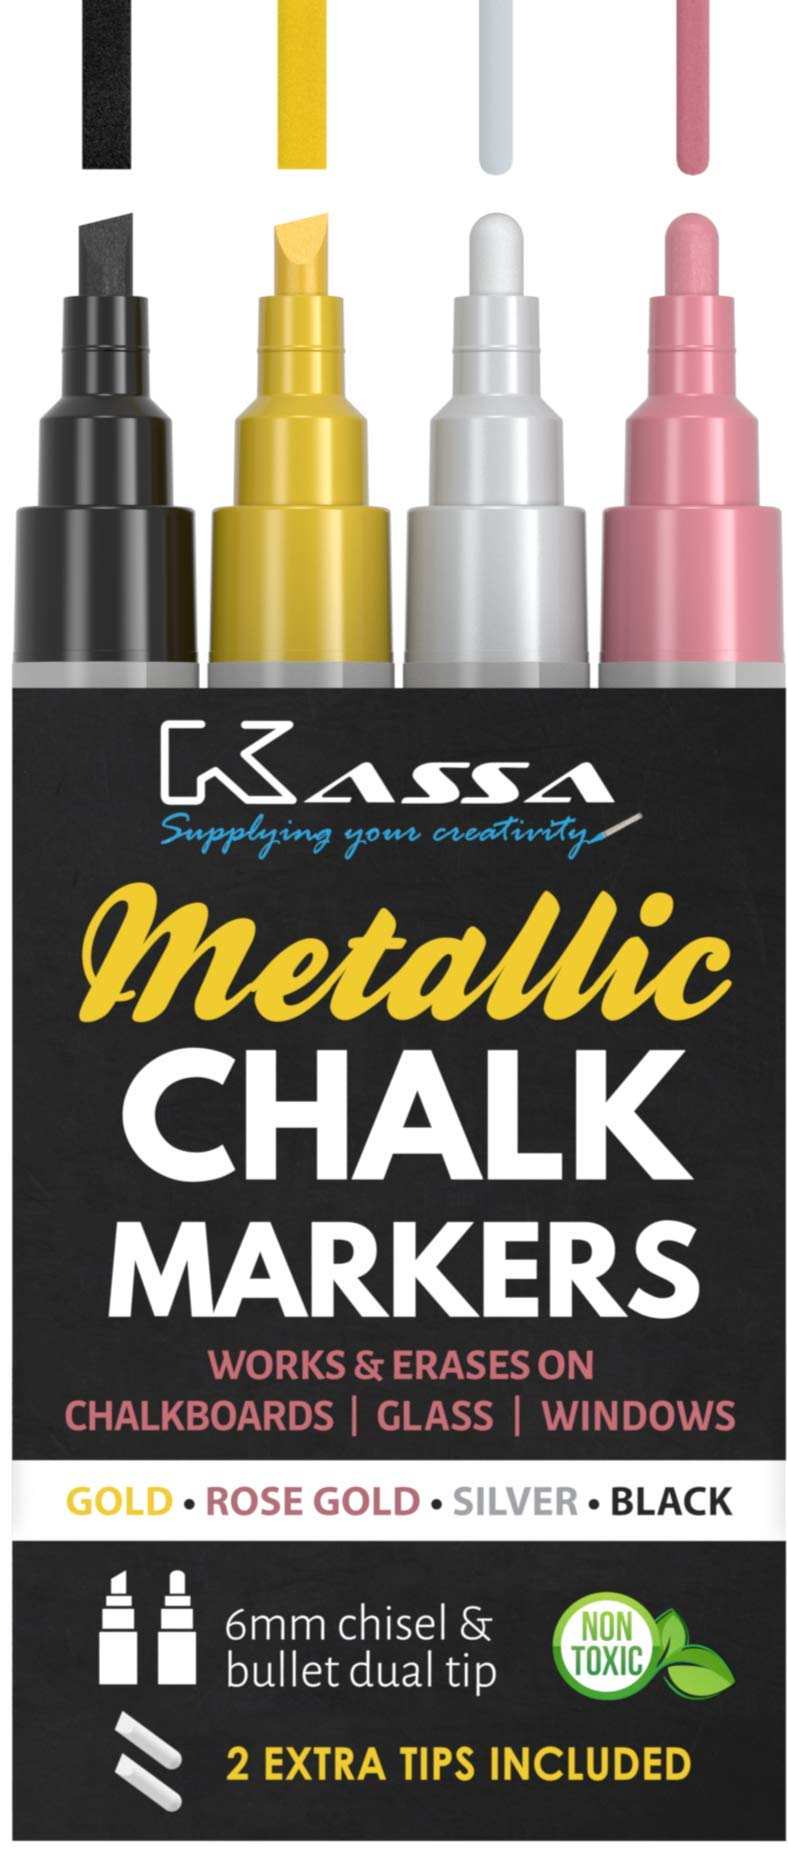 Kassa Metallic Liquid Chalk Markers for Blackboards (Gold, Rose Gold, Silver & Black) - 4 Colored Pack - Chalkboard Pens Erase on Window, Blackboard, Mirror & Glass - Dual Tip Chalk Board Marker